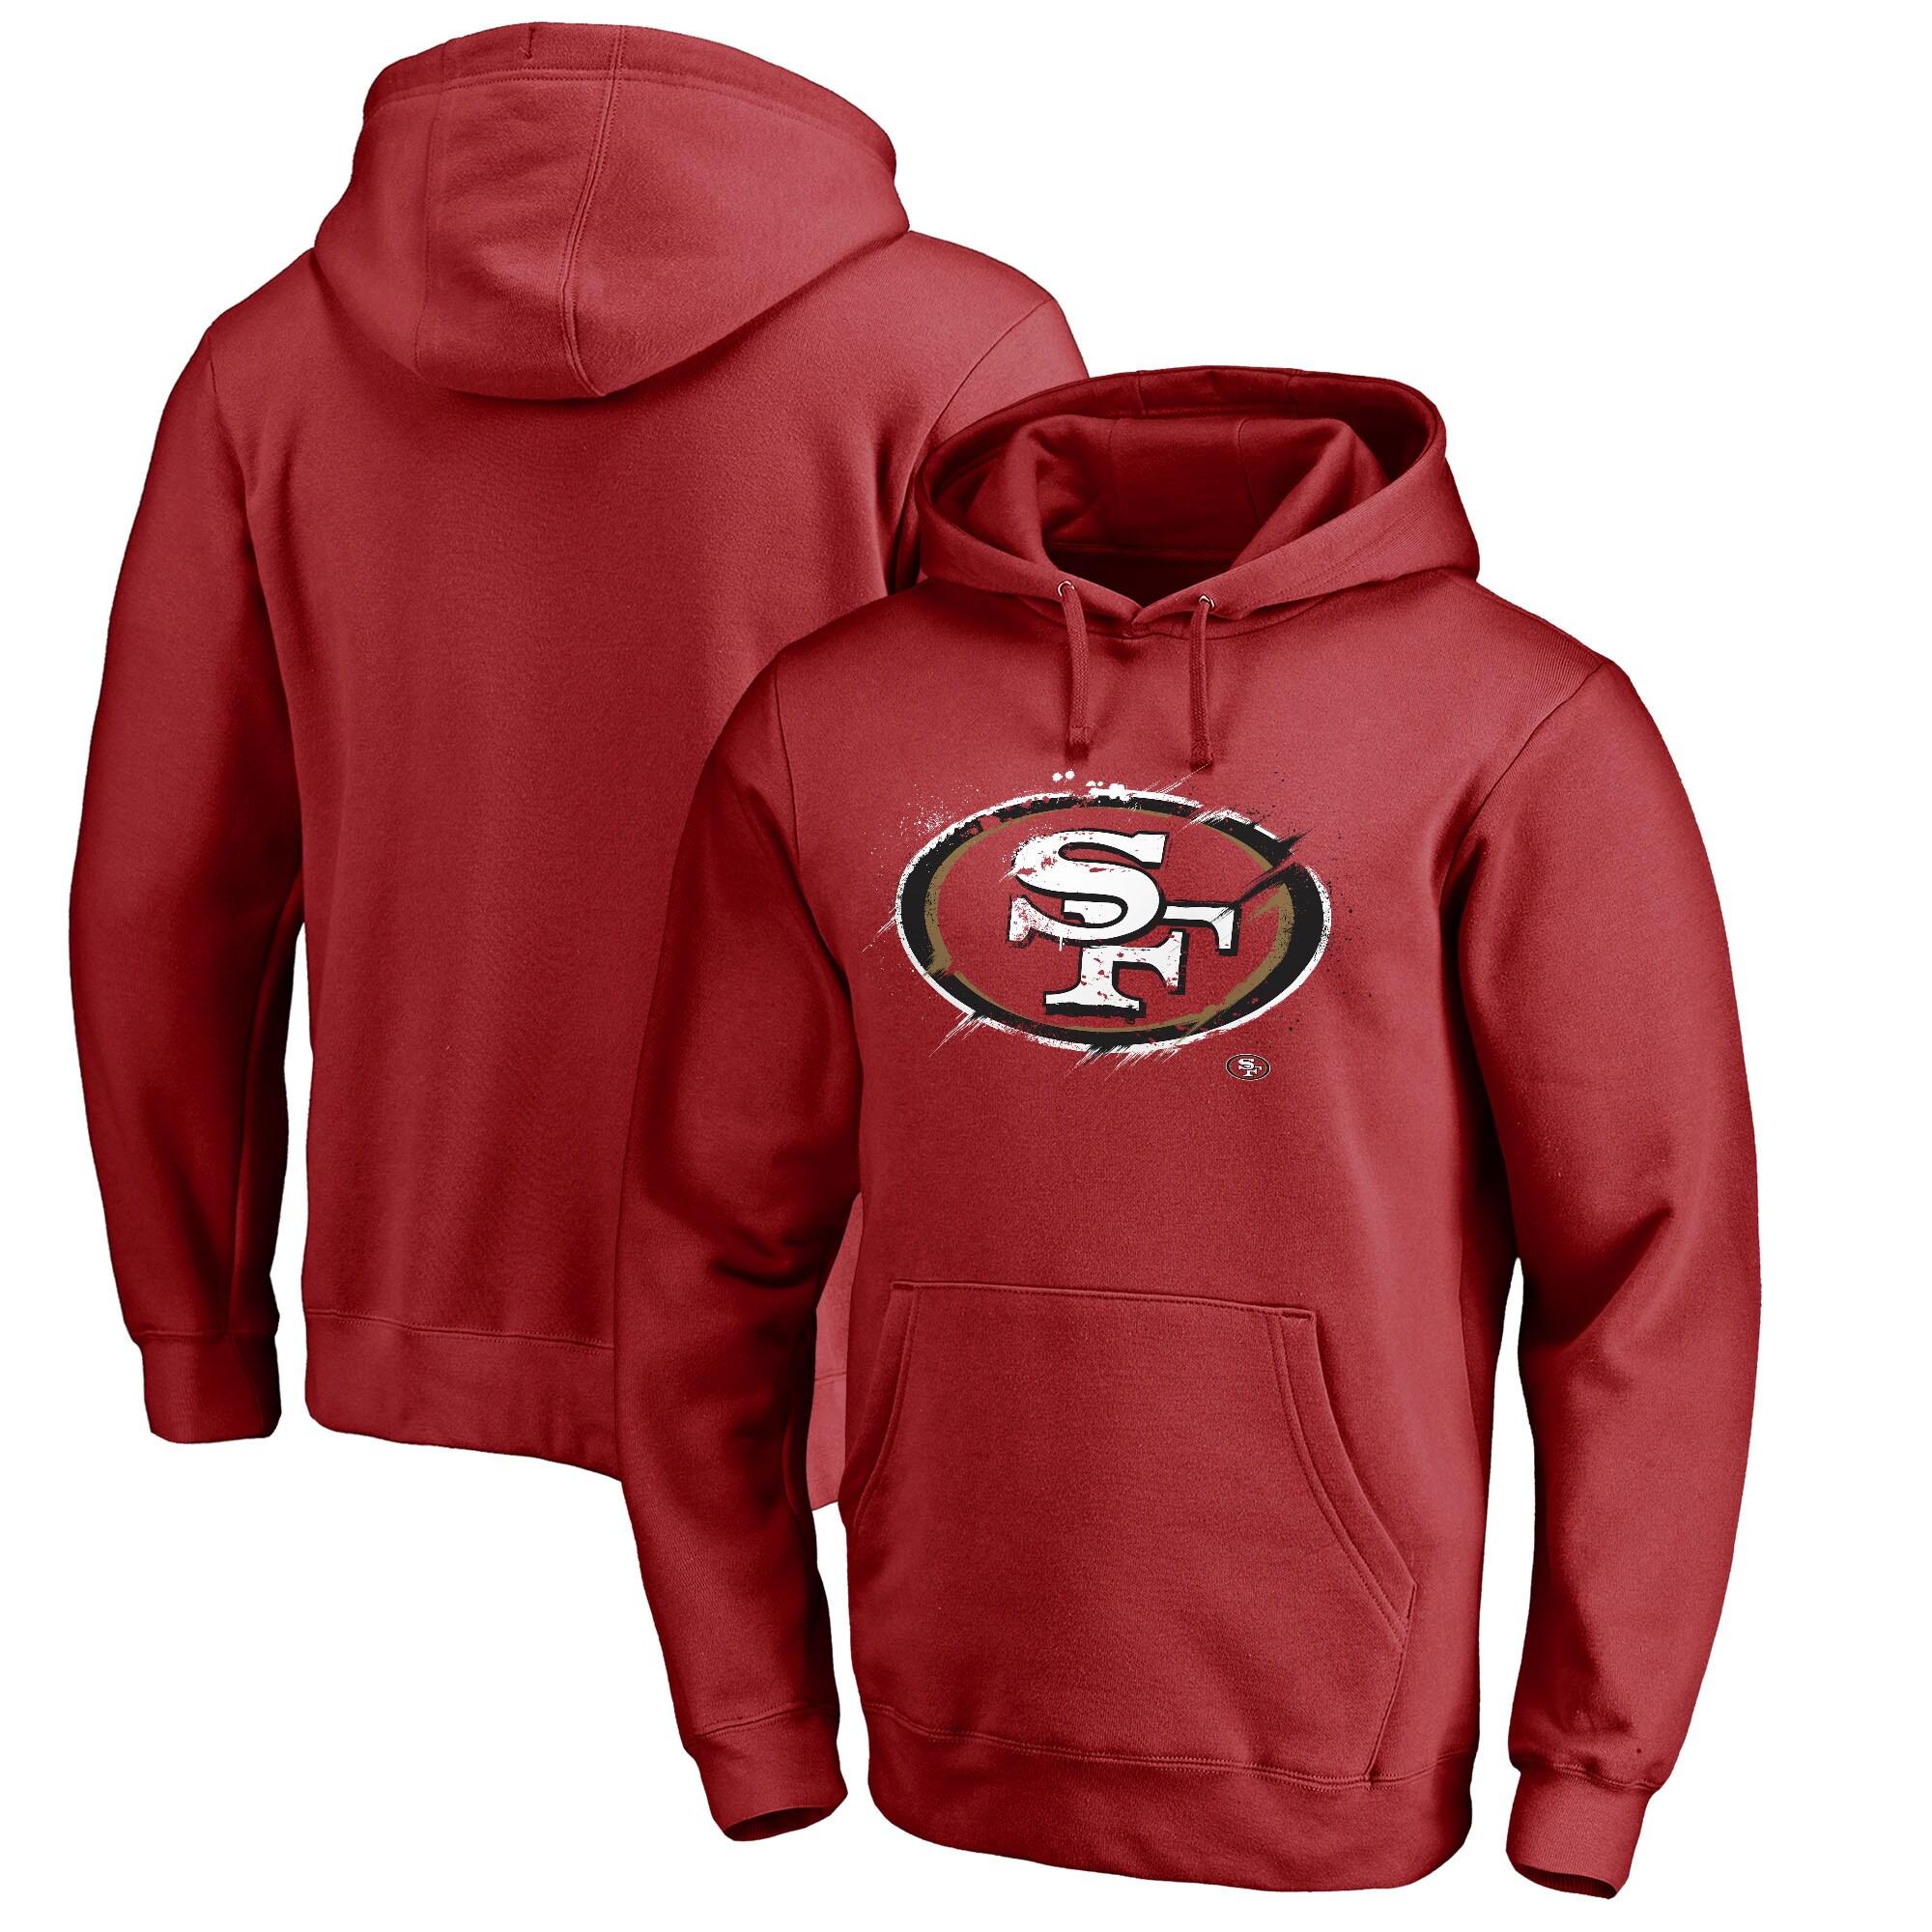 San Francisco 49ers NFL Pro Line by Fanatics Branded Splatter Logo Pullover Hoodie - Scarlet